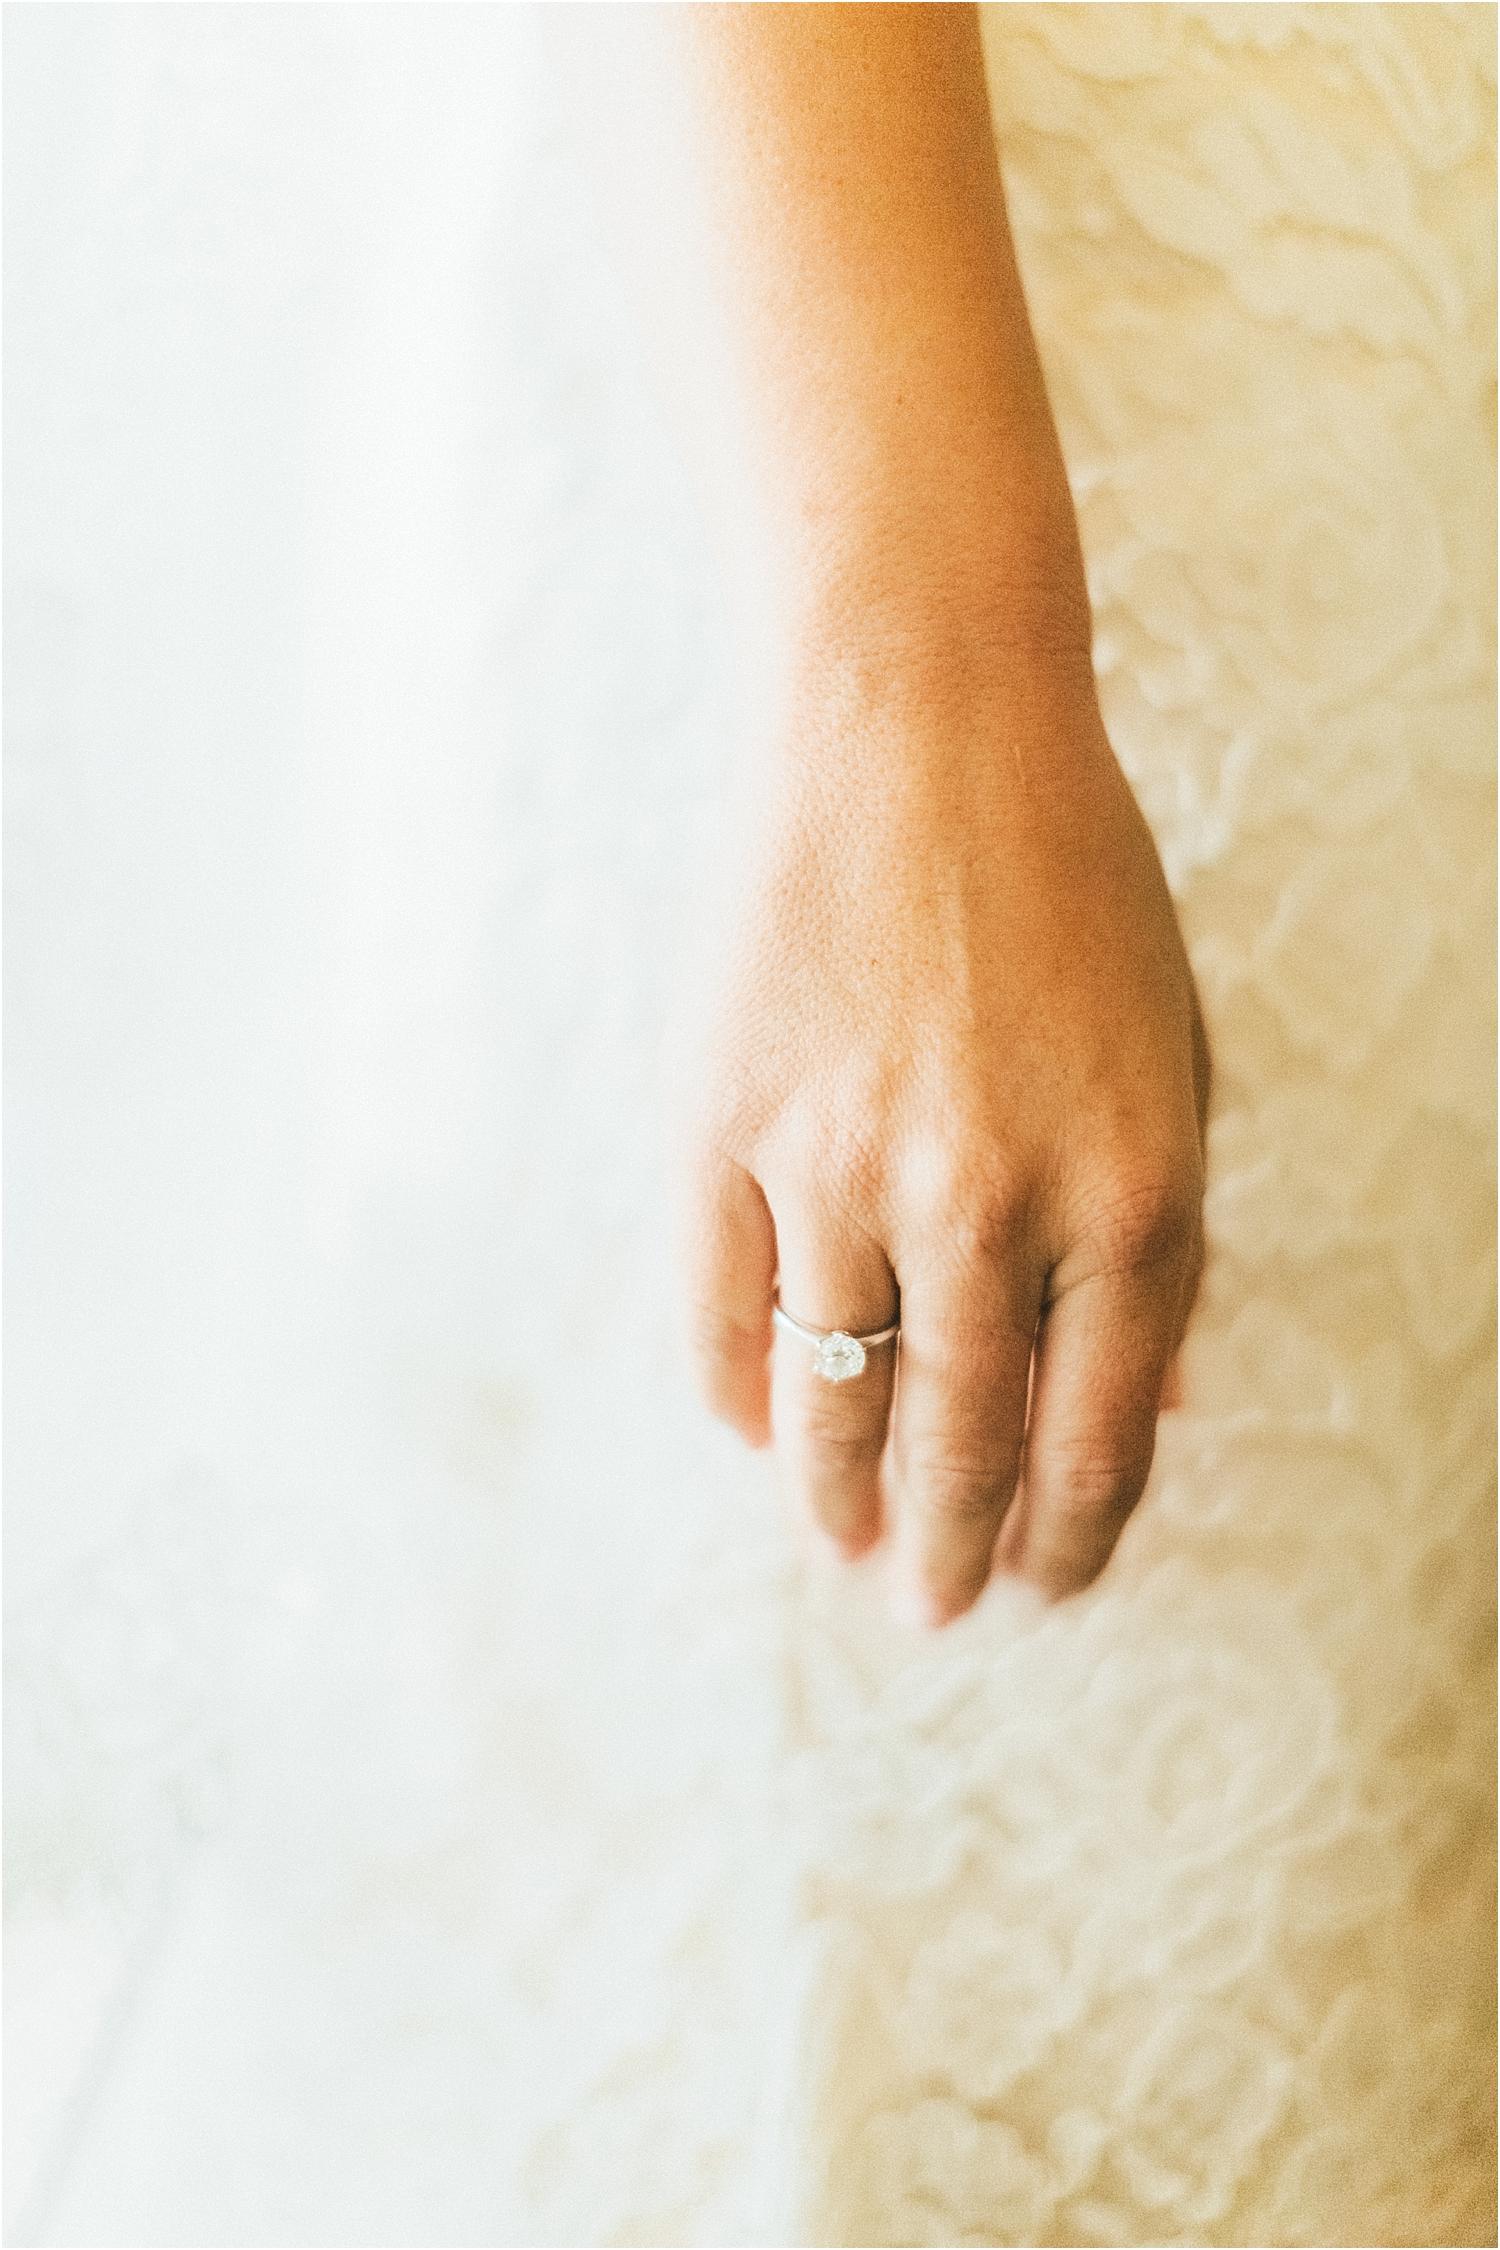 angie-diaz-photography-maui-wedding-ironwoods-beach_0014.jpg